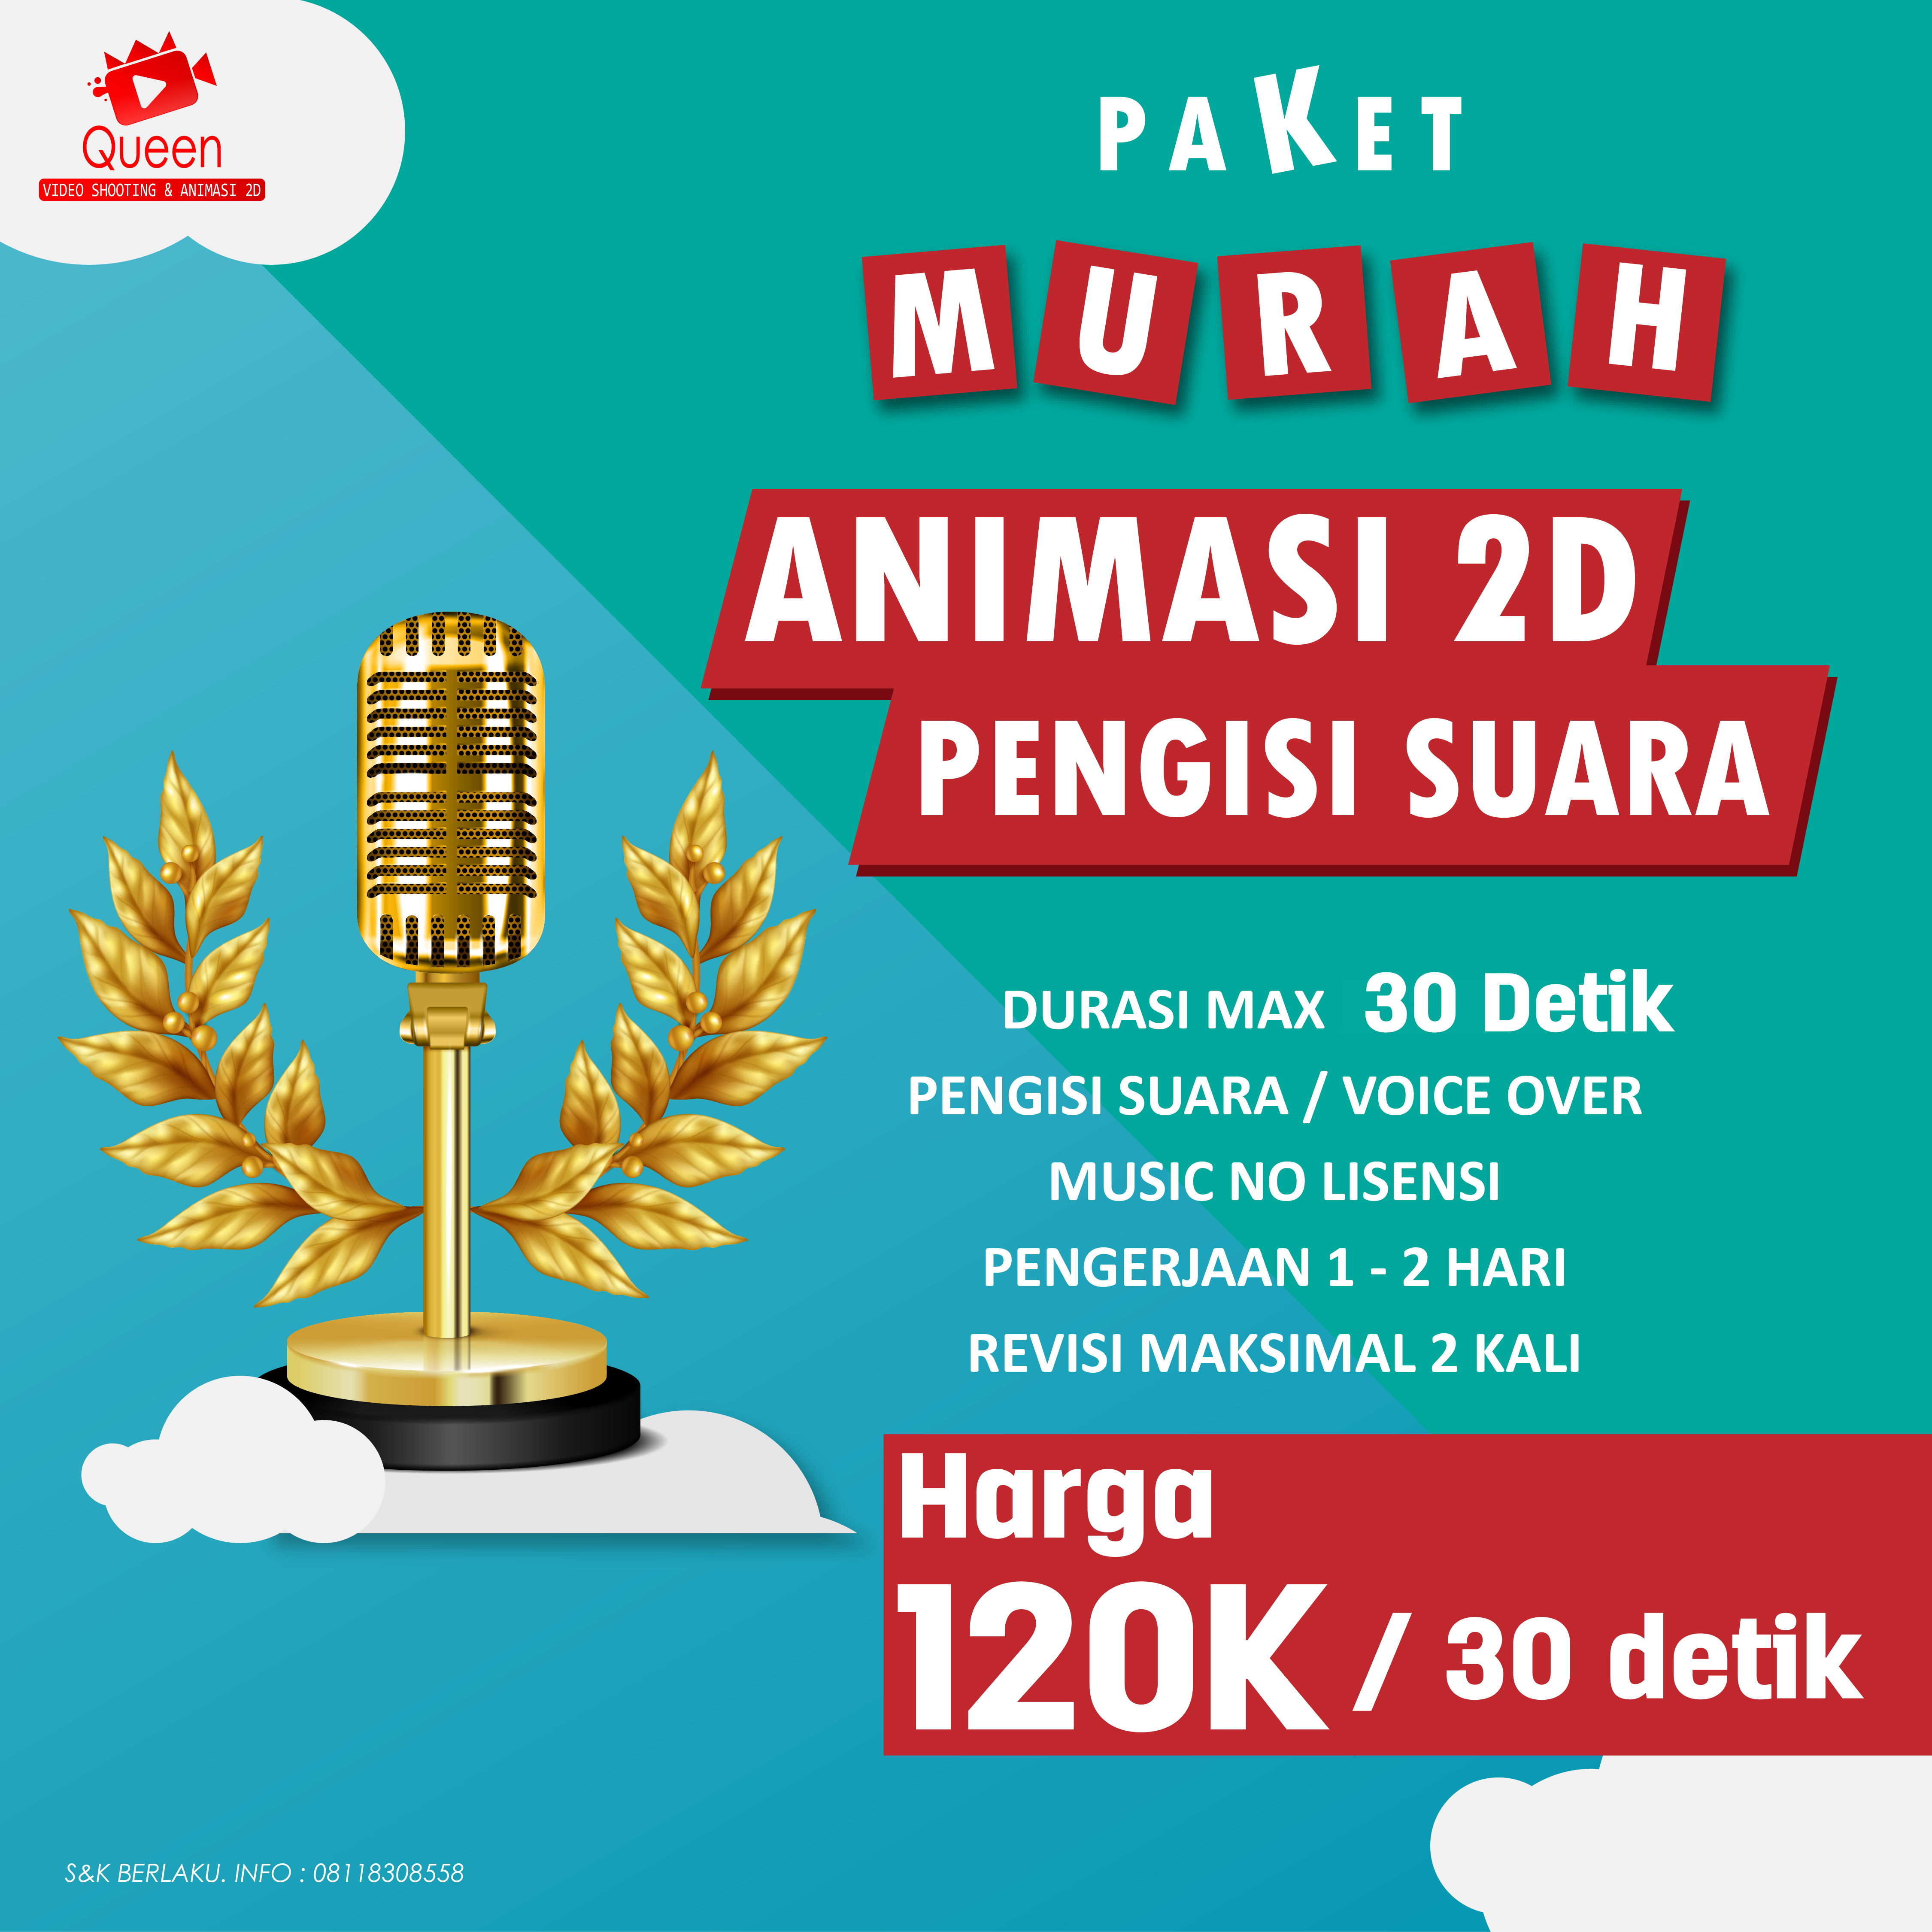 Price List Animasi 2D 120k dengan voice